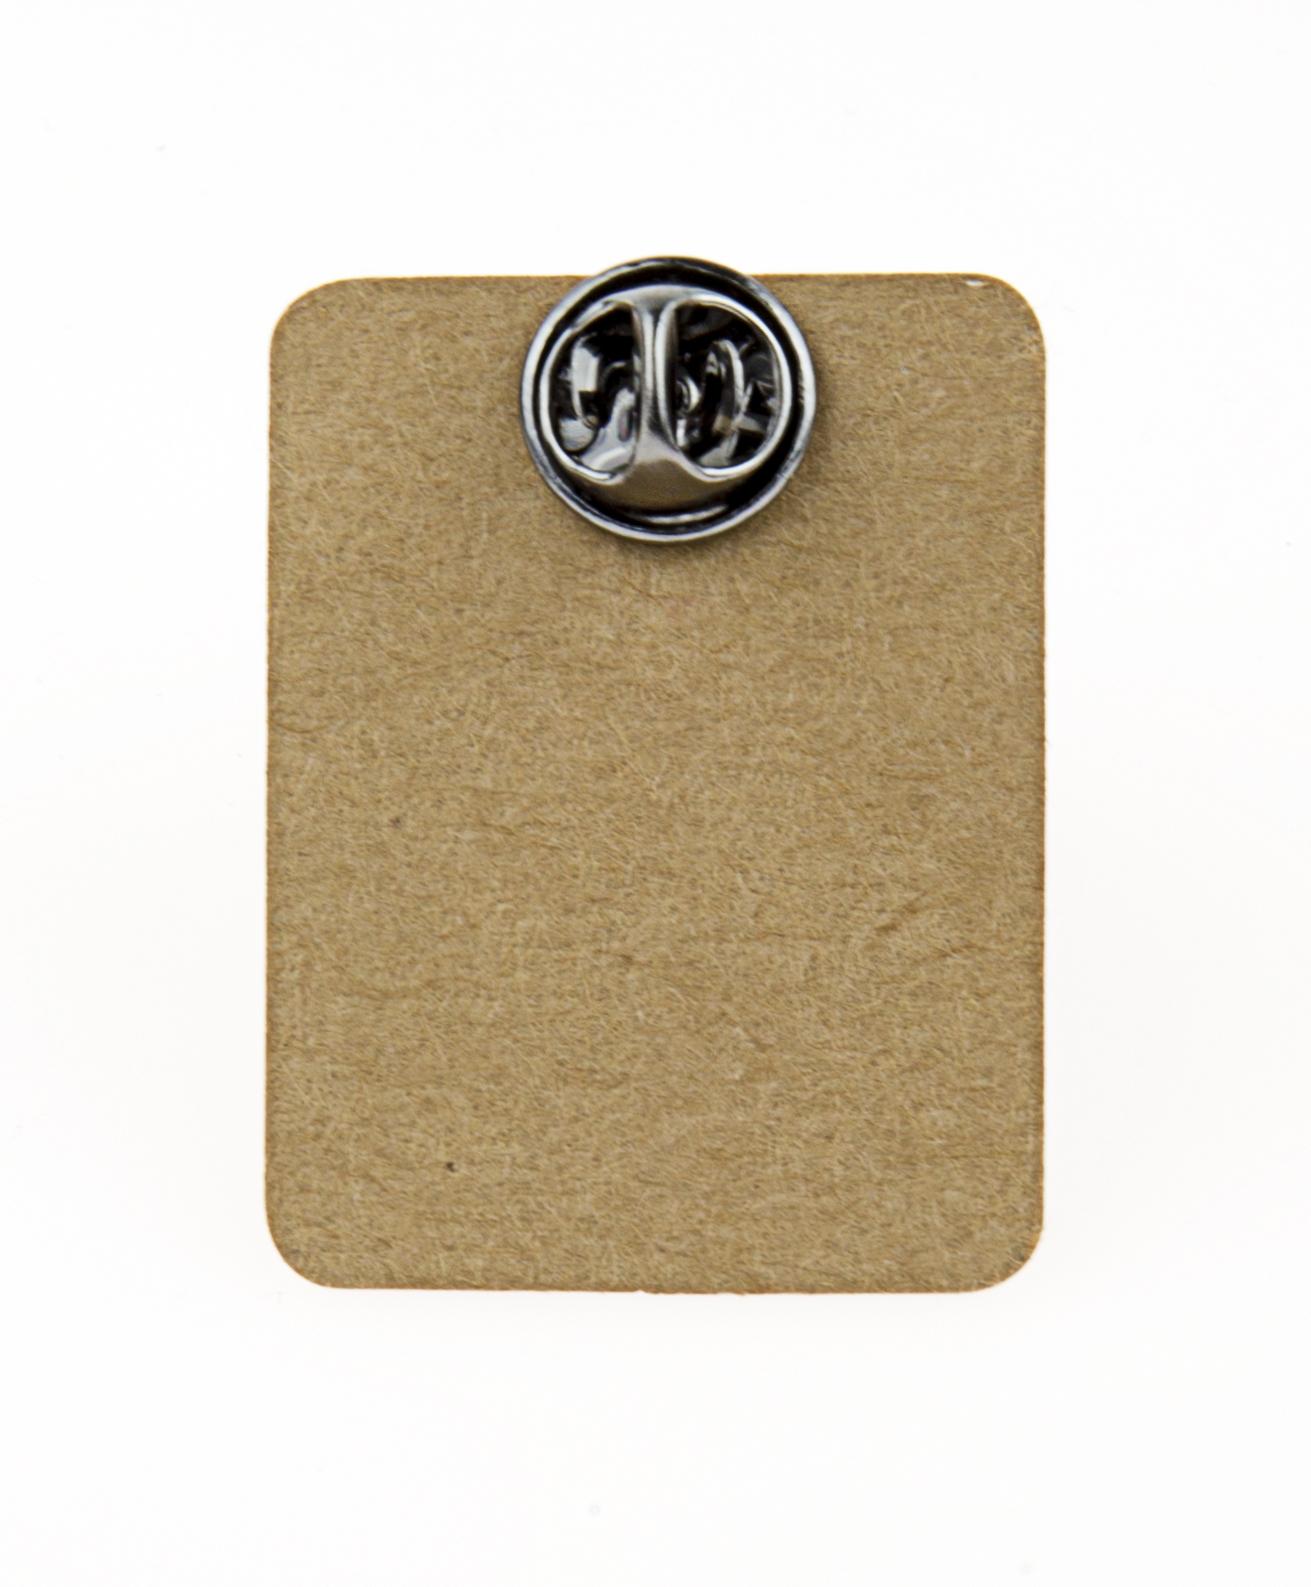 Metal Elephant Enamel Pin Badge